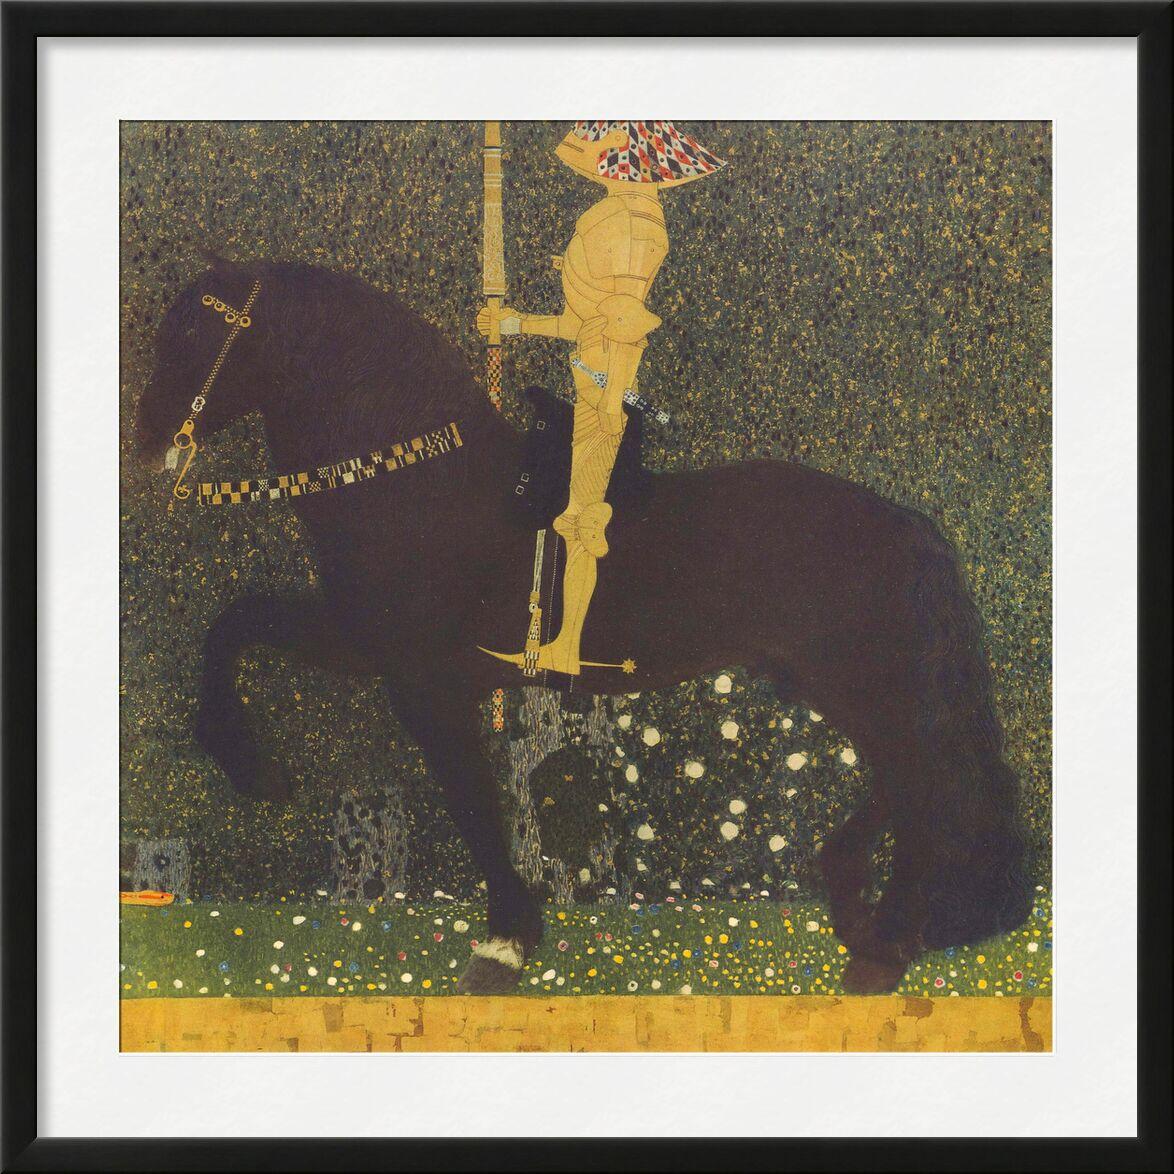 Life Is a Struggle (The Golden Knight) 1903 - Gustav Klimt from AUX BEAUX-ARTS, Prodi Art, painting, gold, combat, War, horse, KLIMT